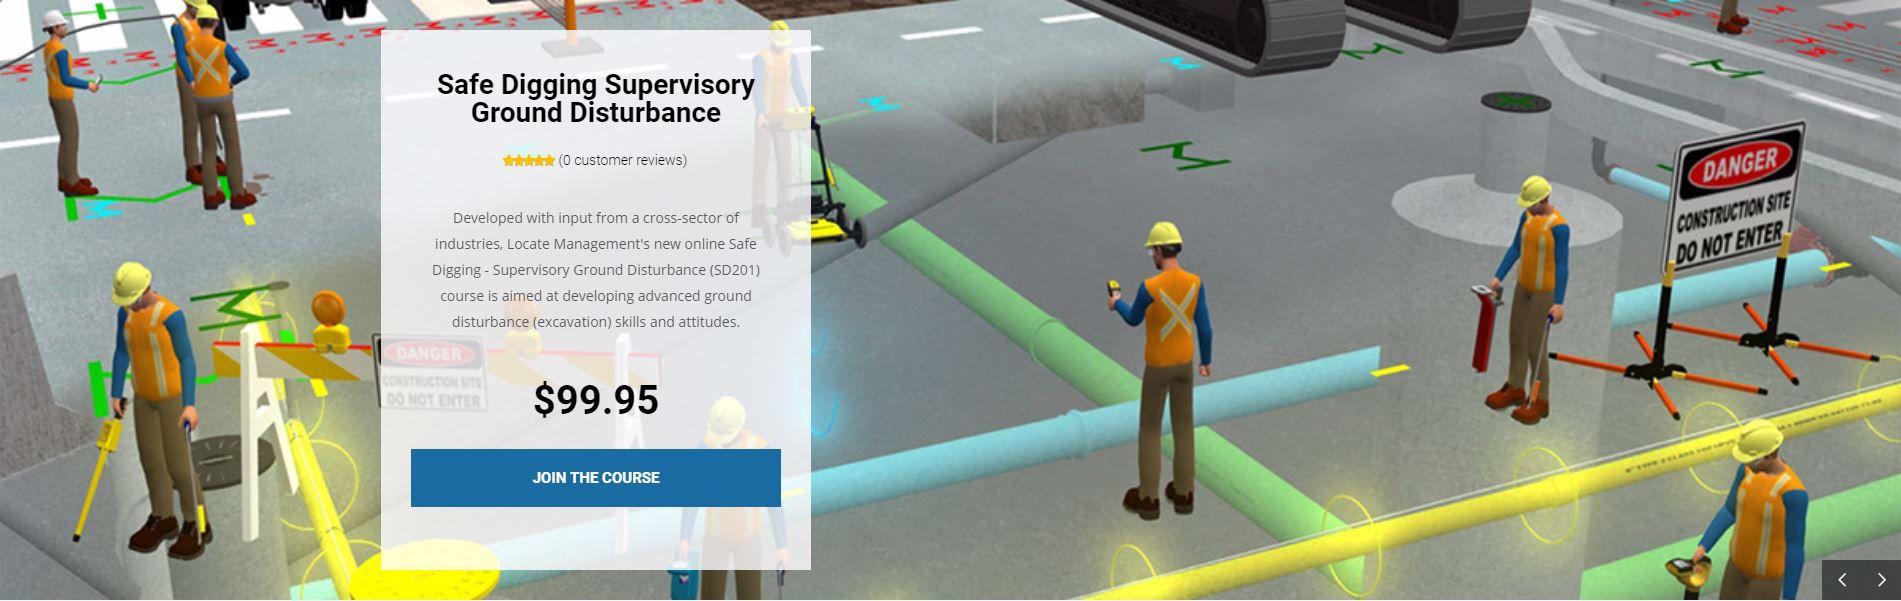 Safe Digging Supervisory Ground Disturbance Course